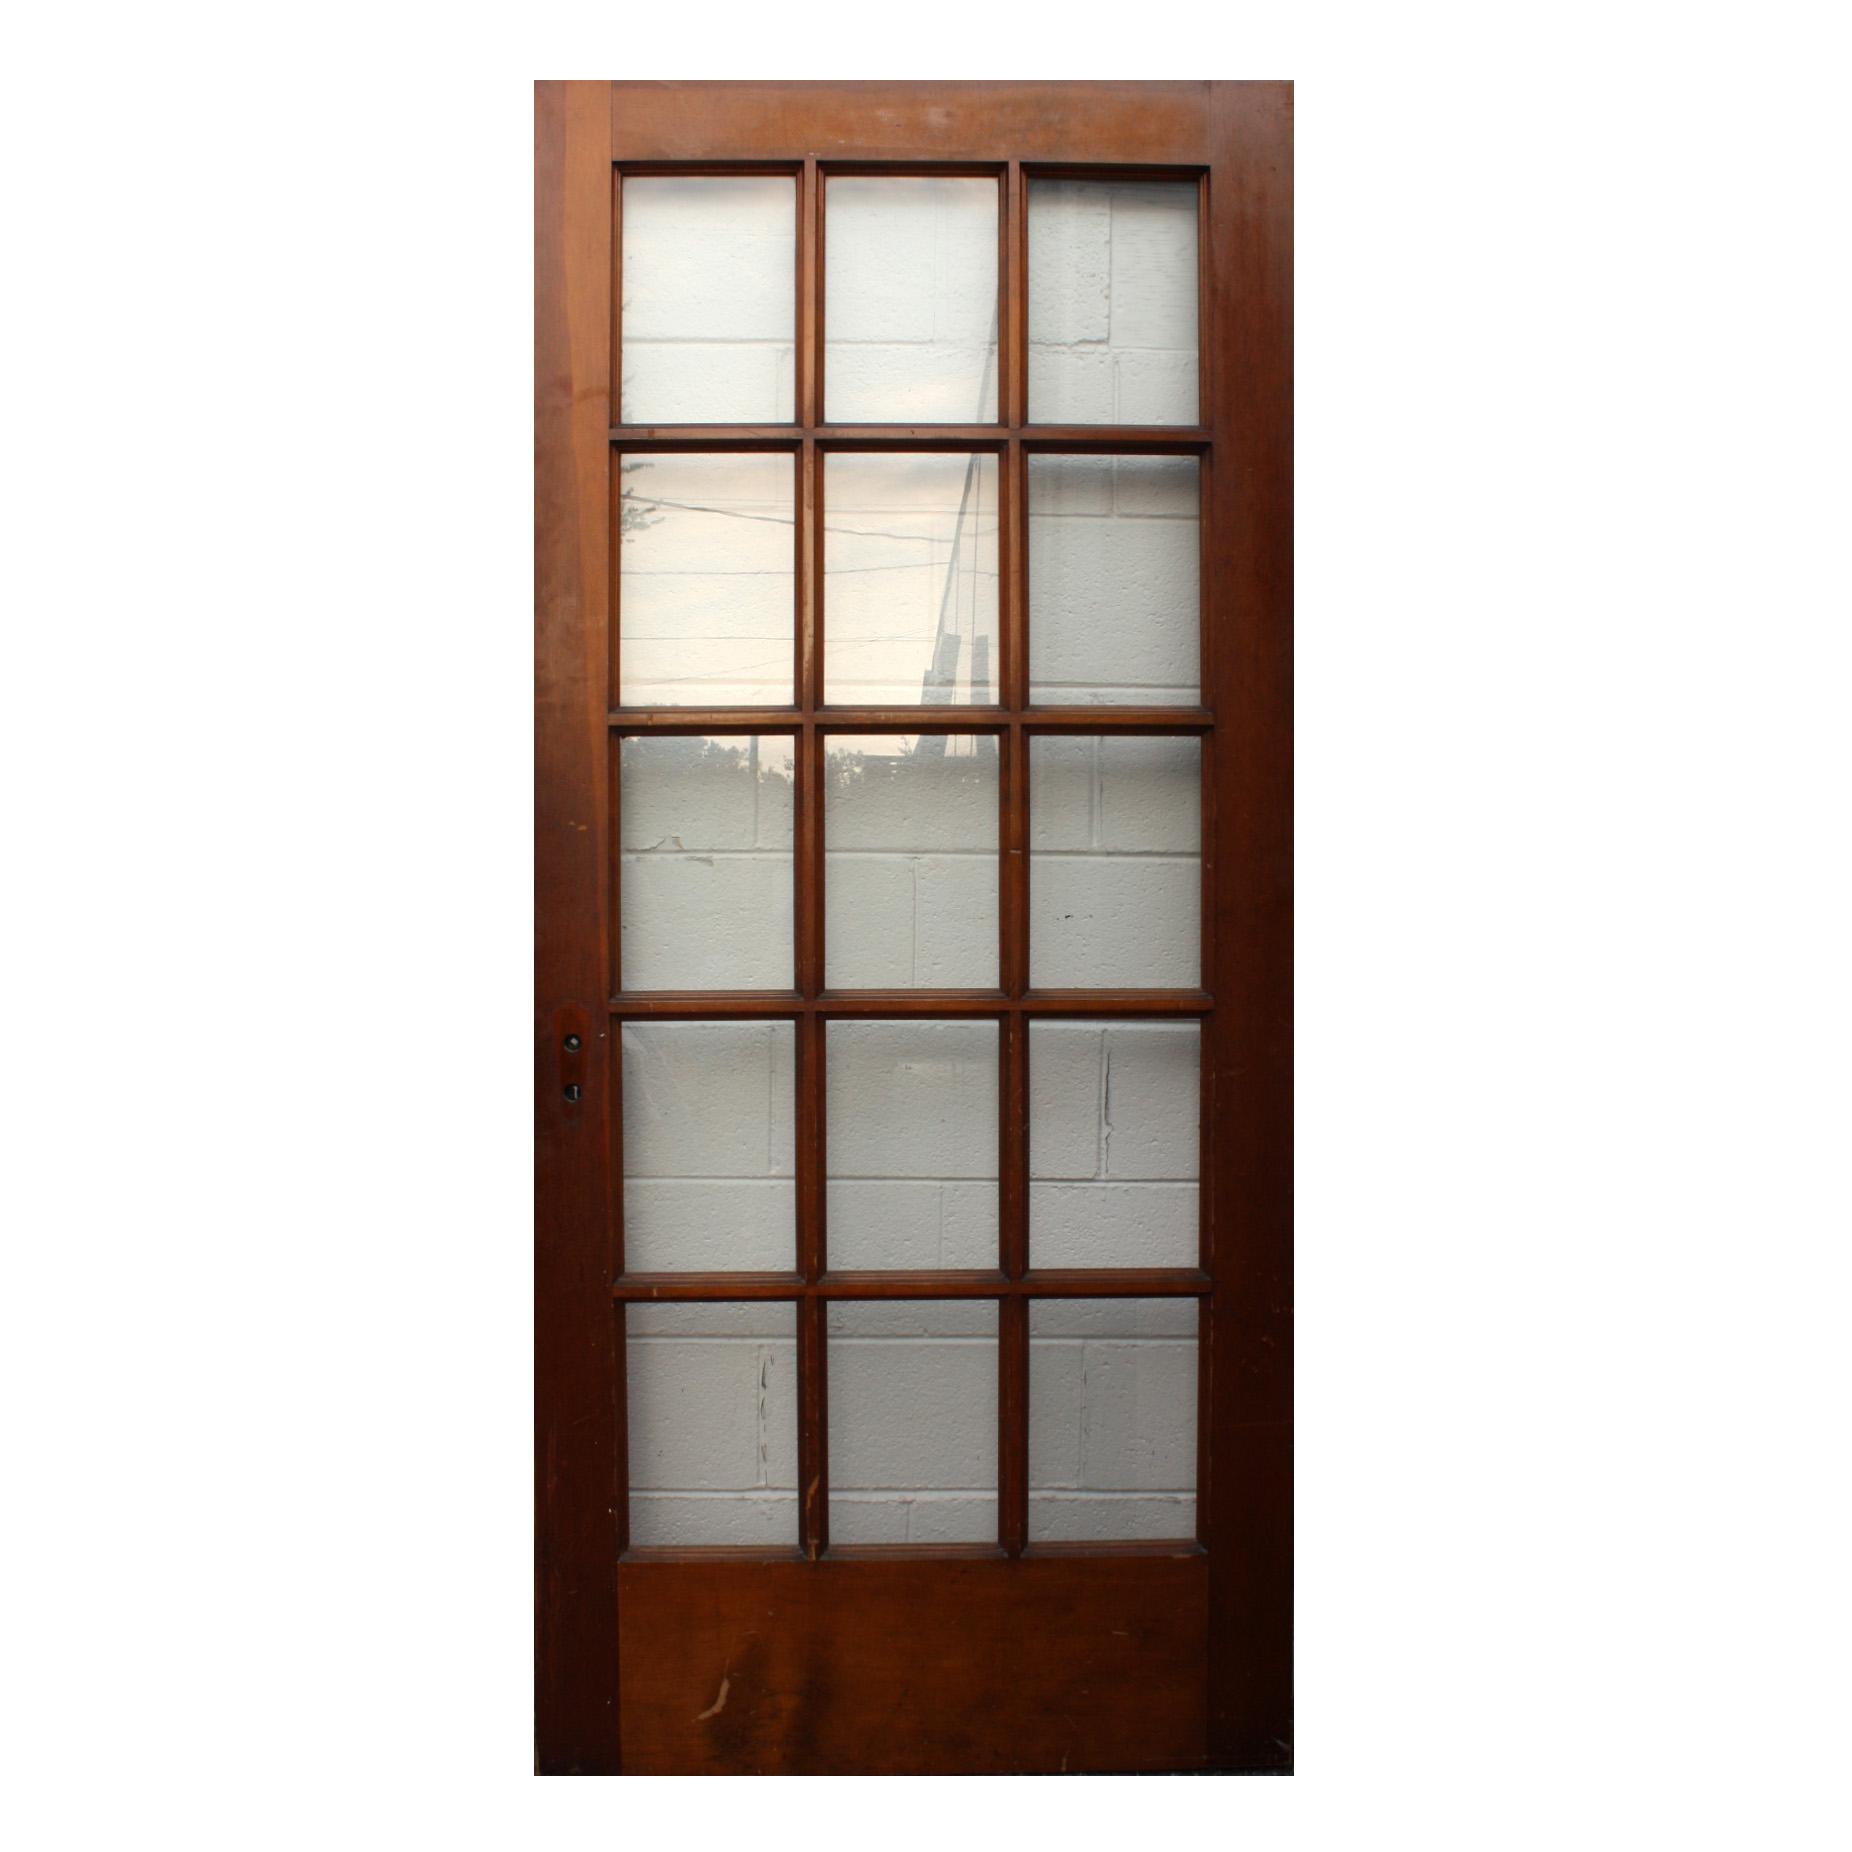 Emejing 15 Light Exterior Door Gallery - Decoration Design Ideas ...